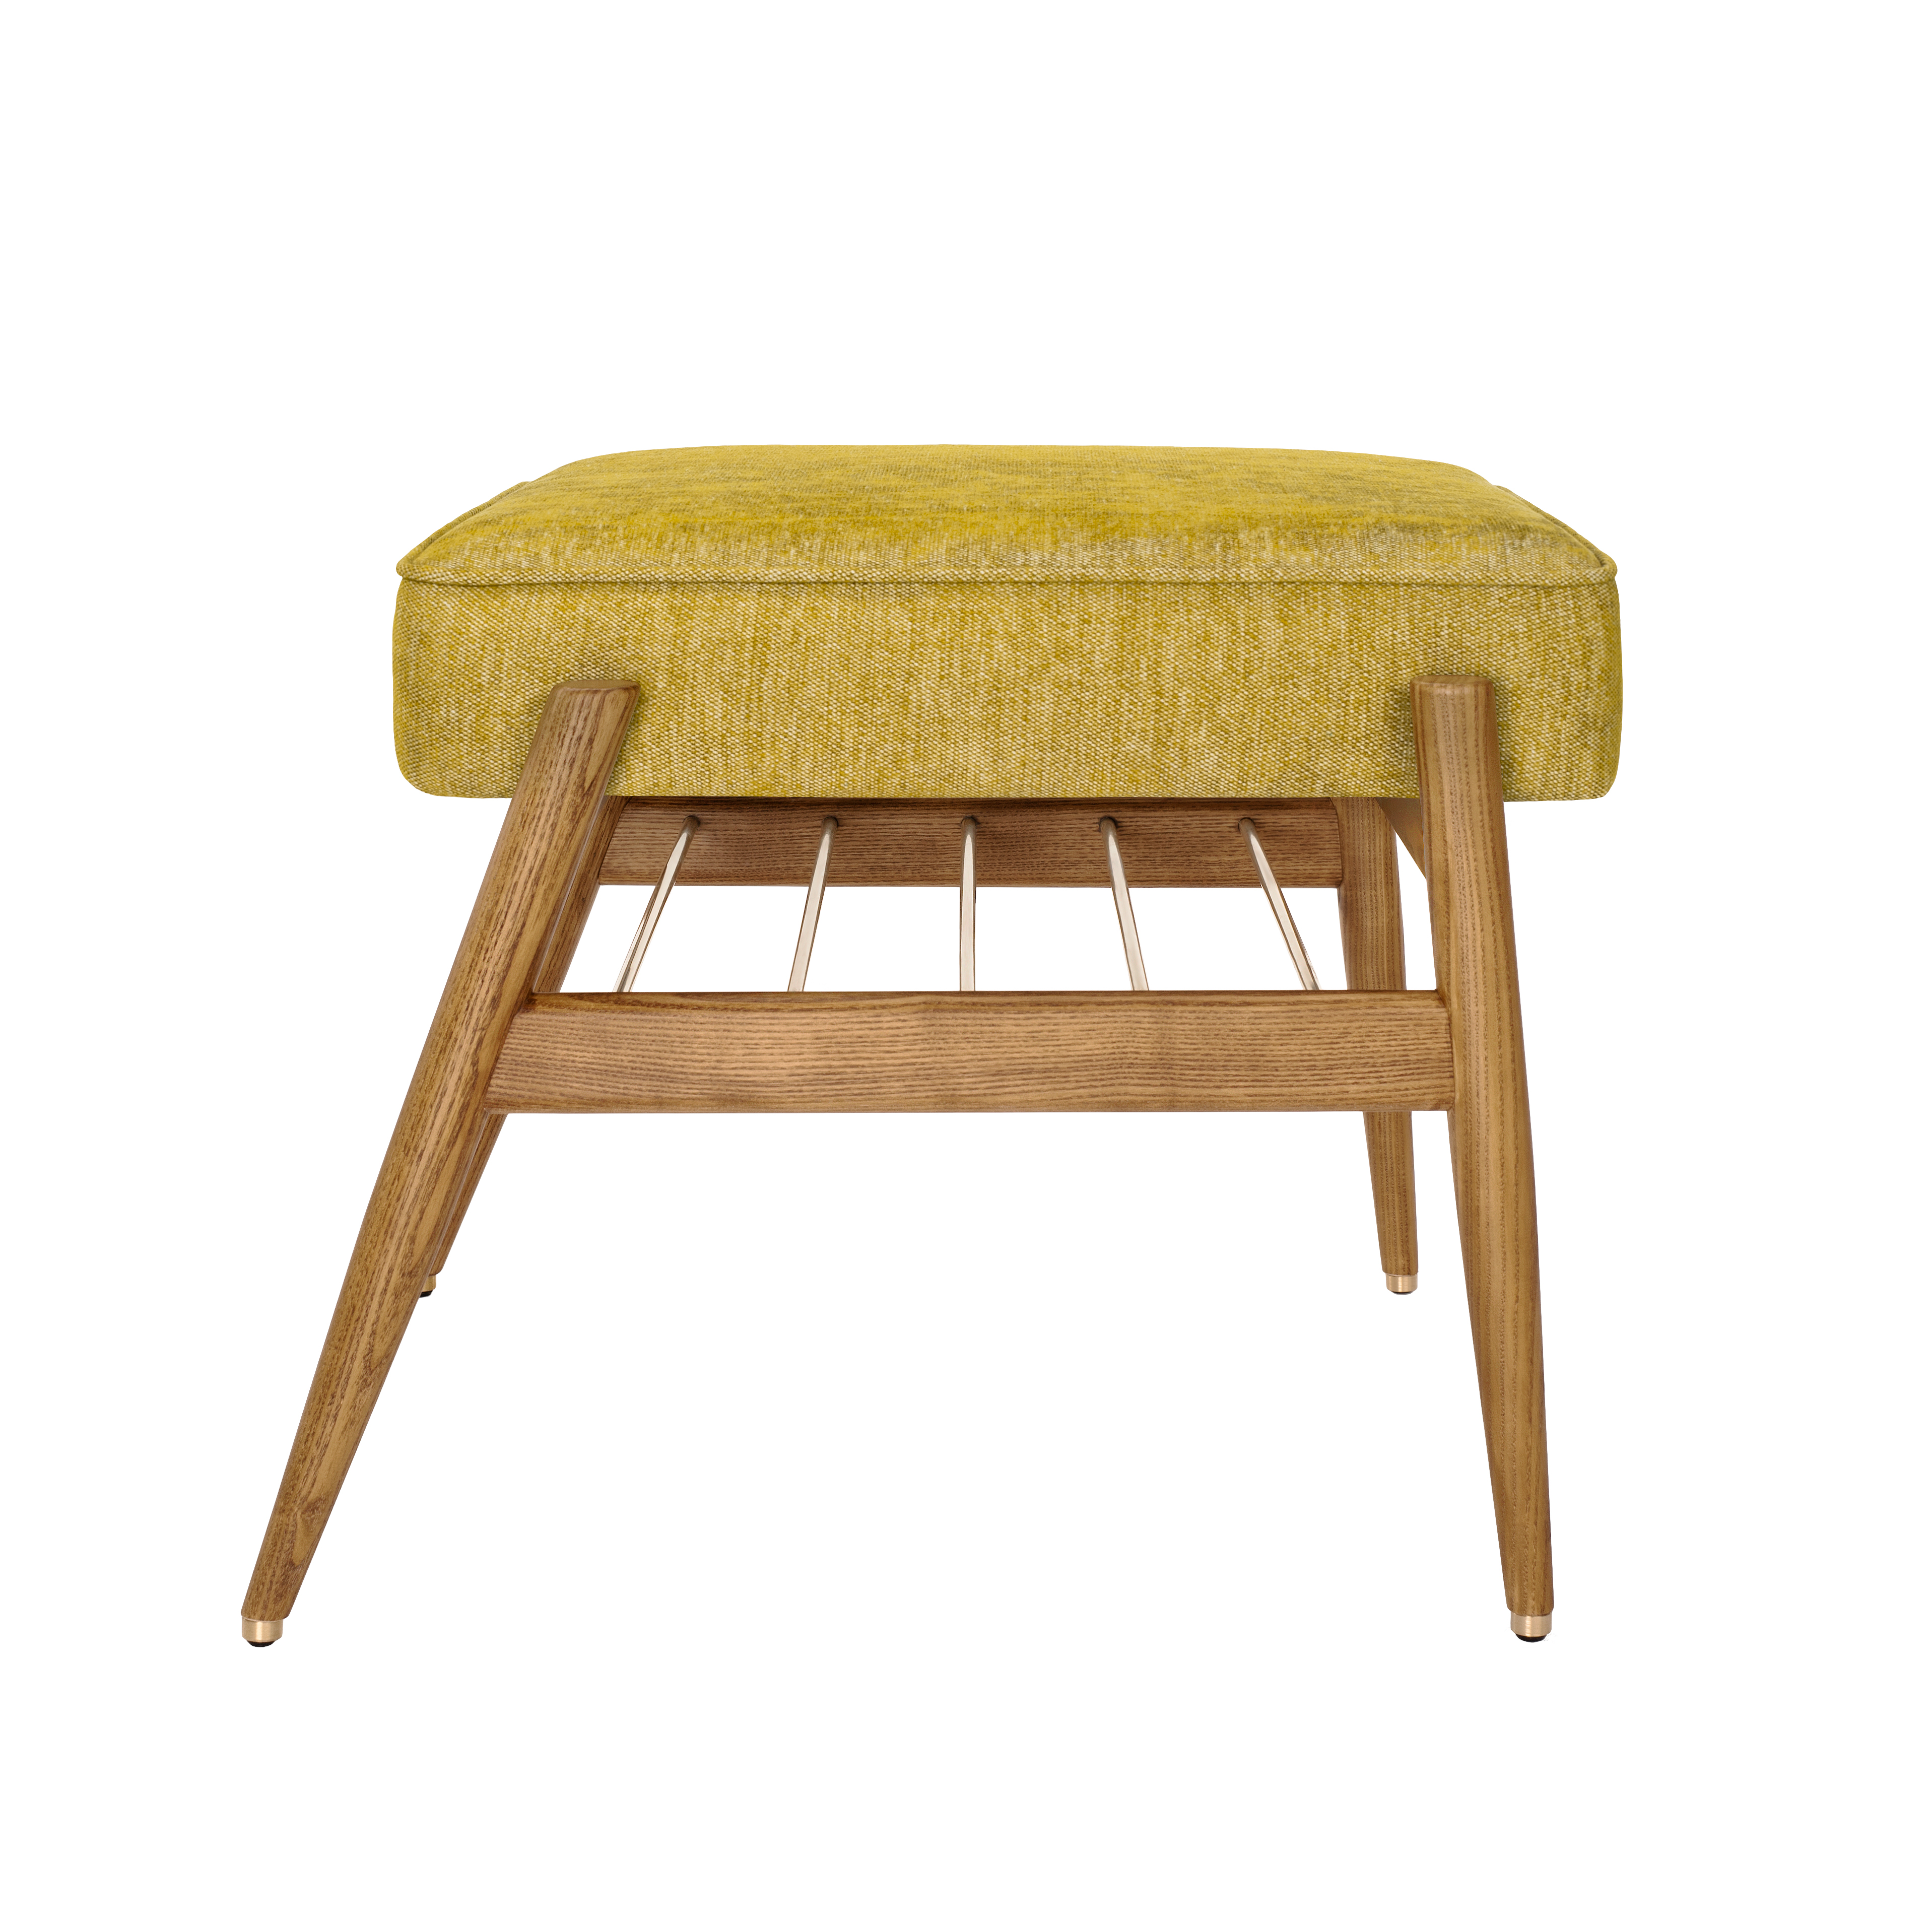 sessel, mobel, wohnen, LOUNGE SESSEL FOX I LOFT - 366 concept footrest ash 02 loft mustard